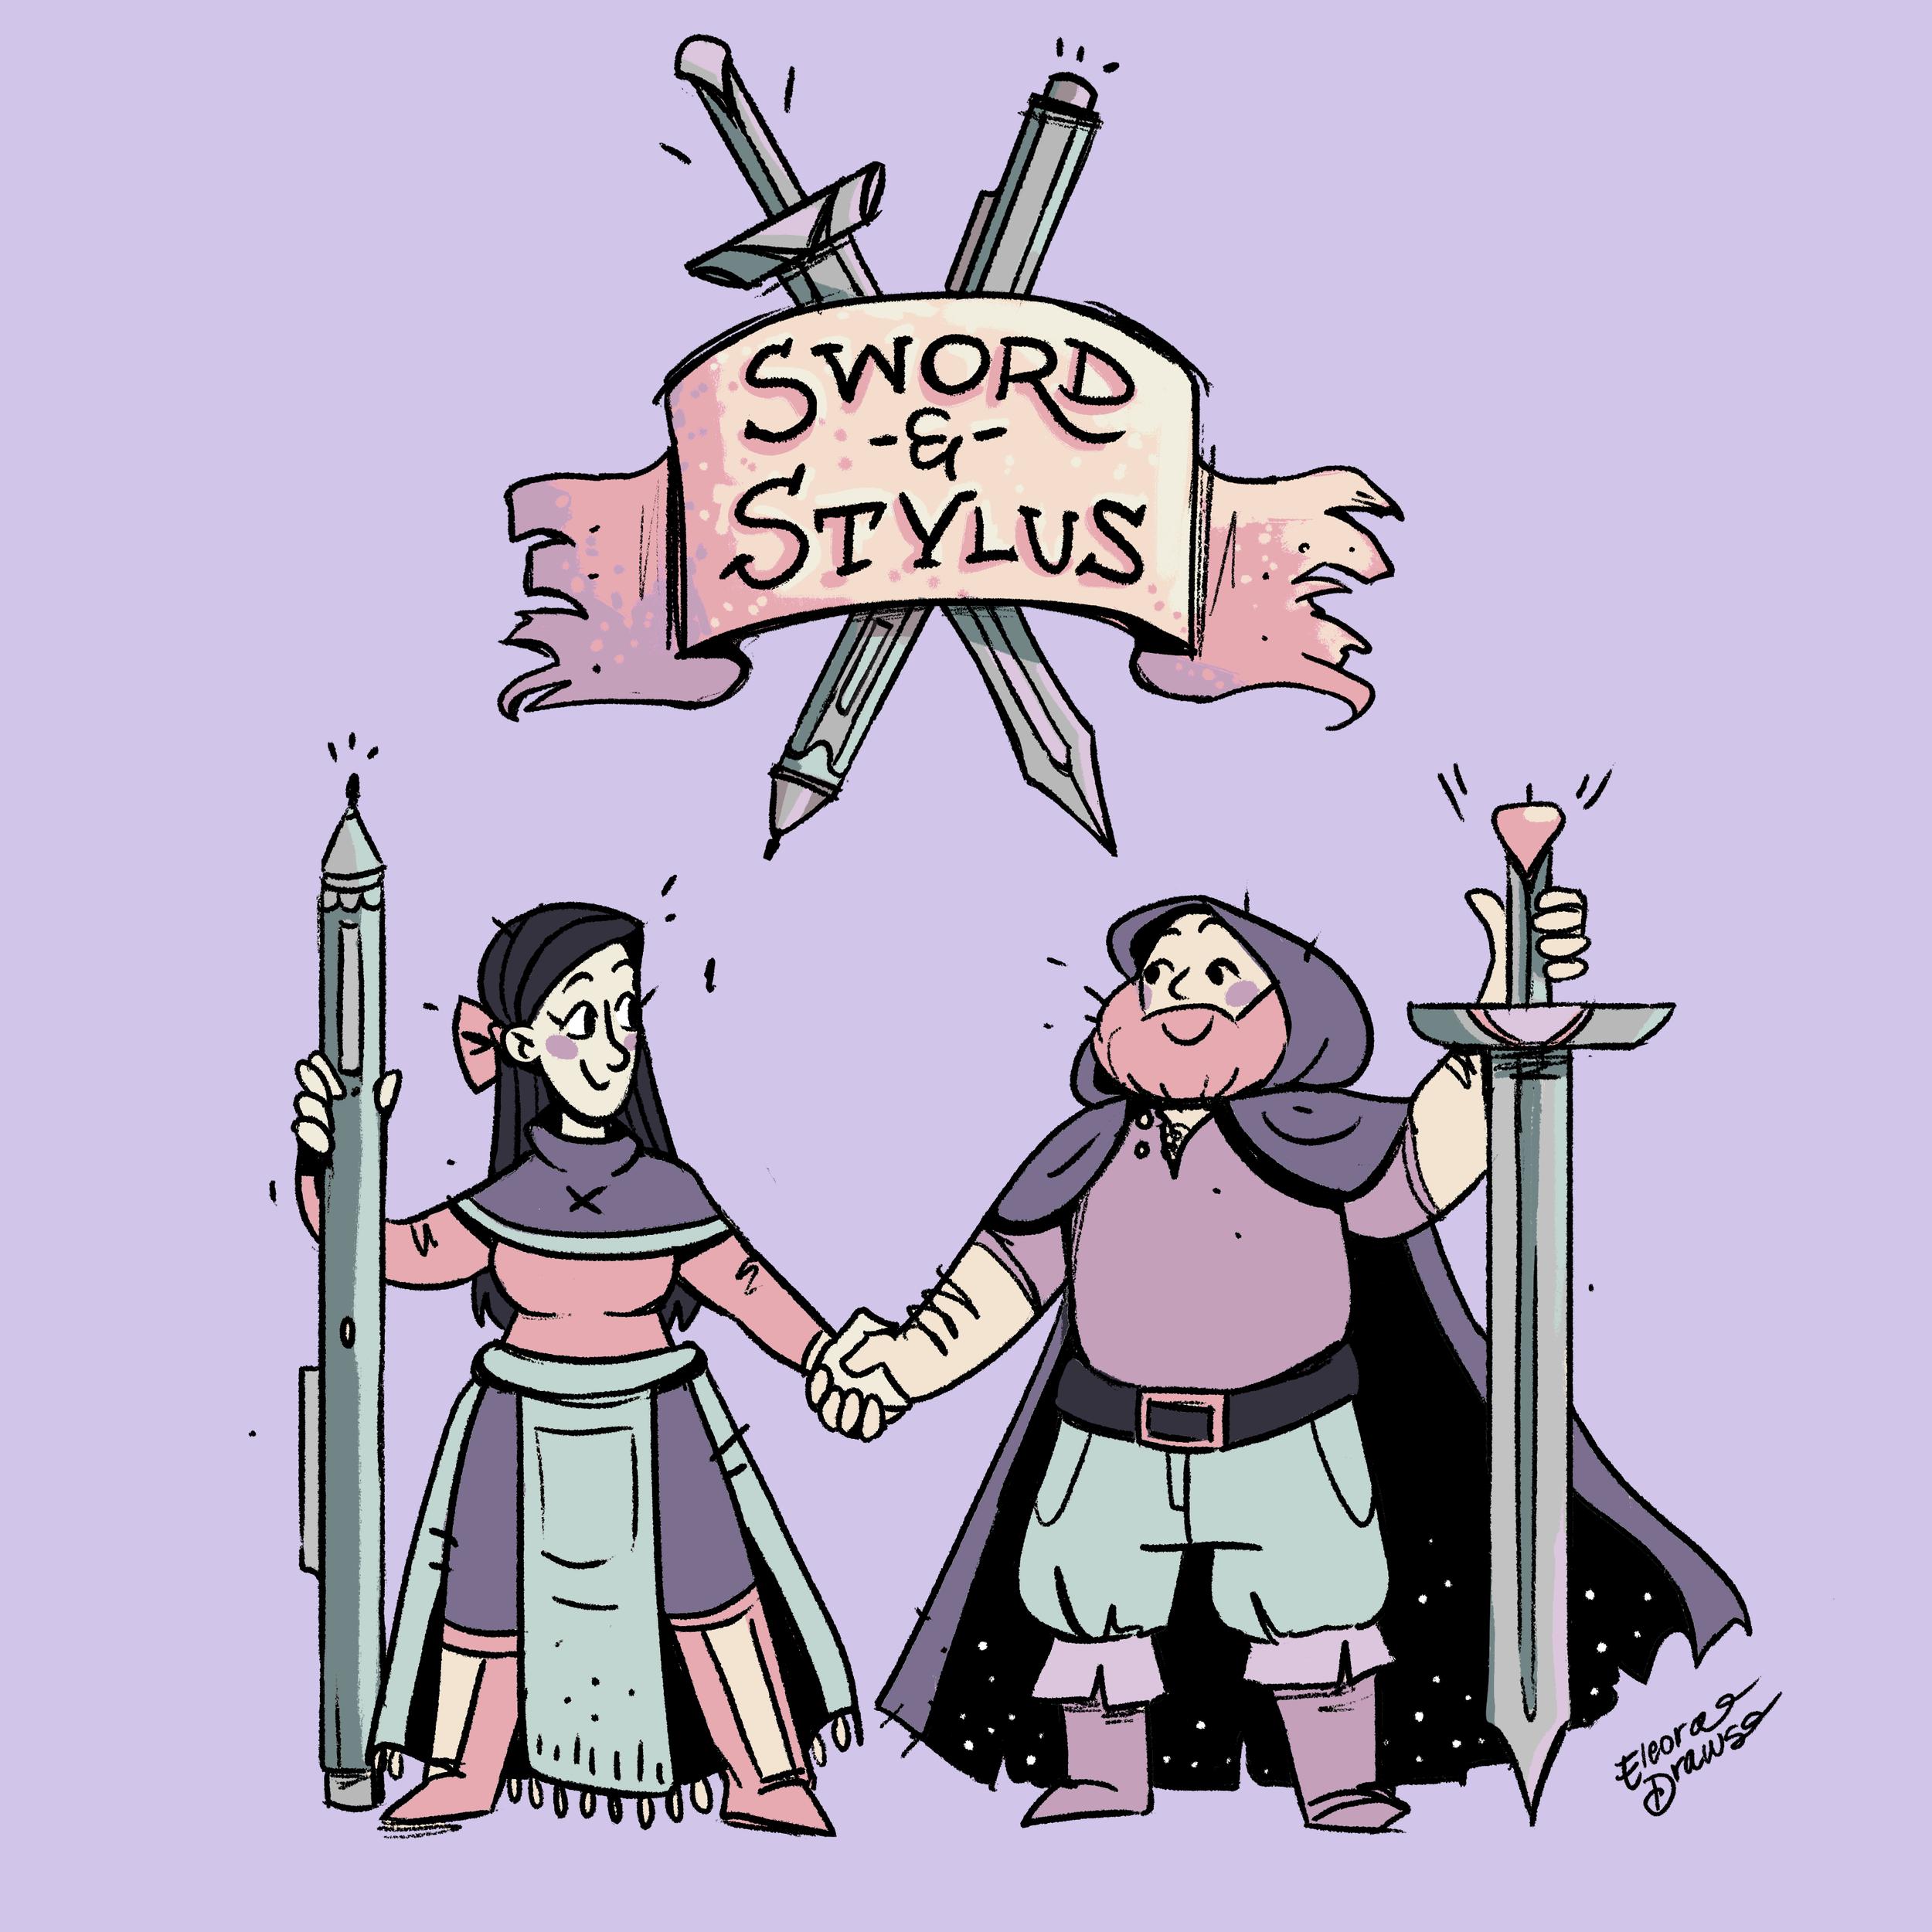 Sword & Stylus